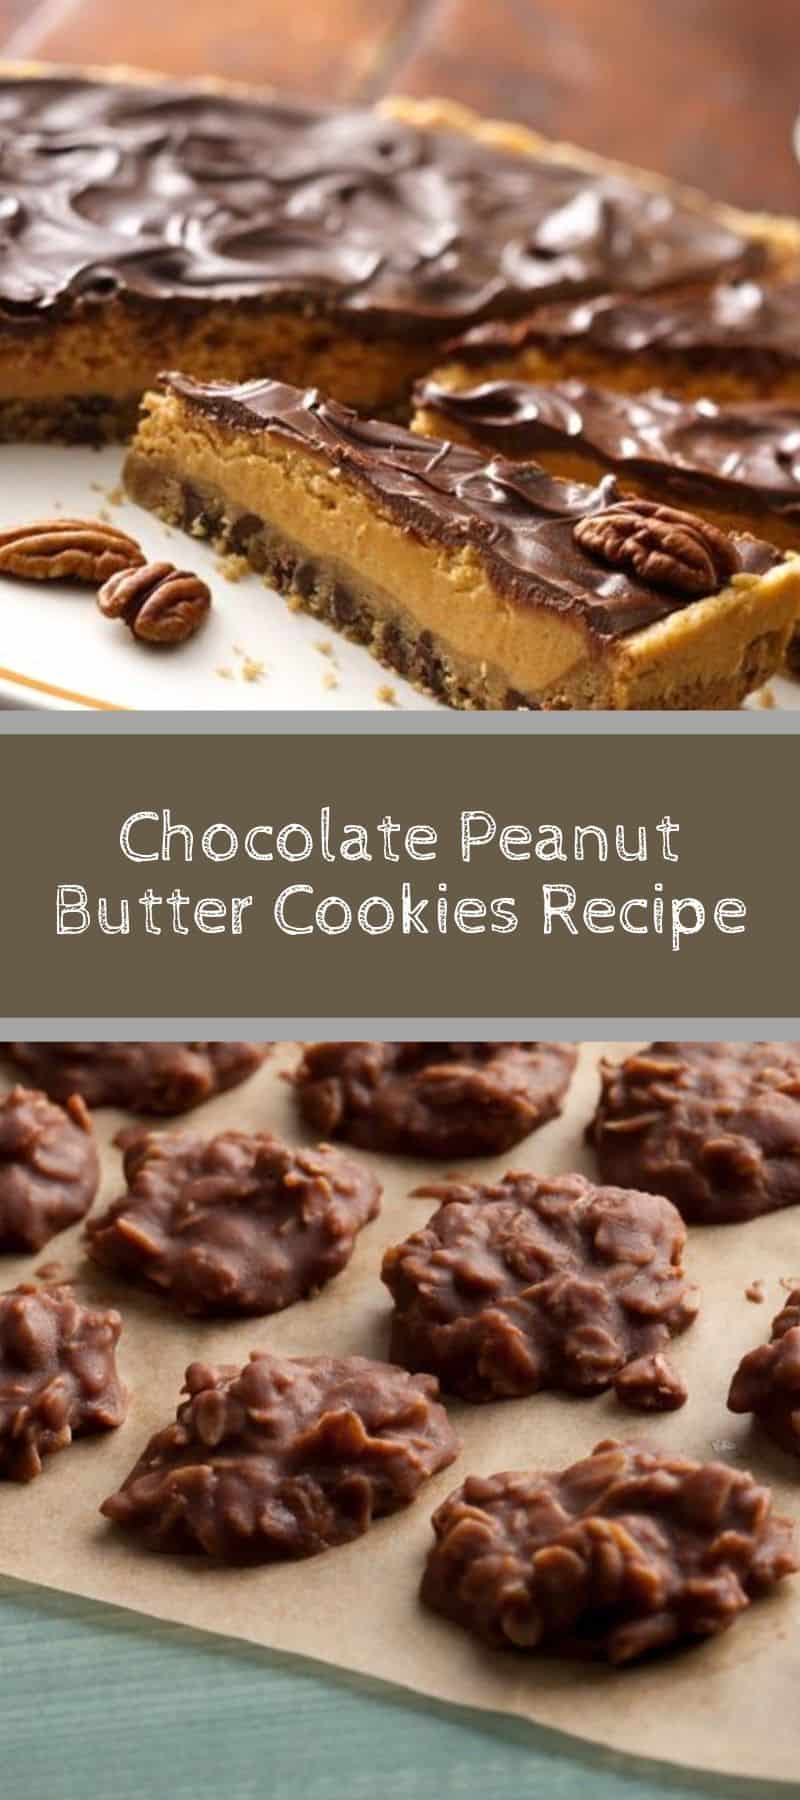 Chocolate-Peanut-Butter-Cookies-Recipe